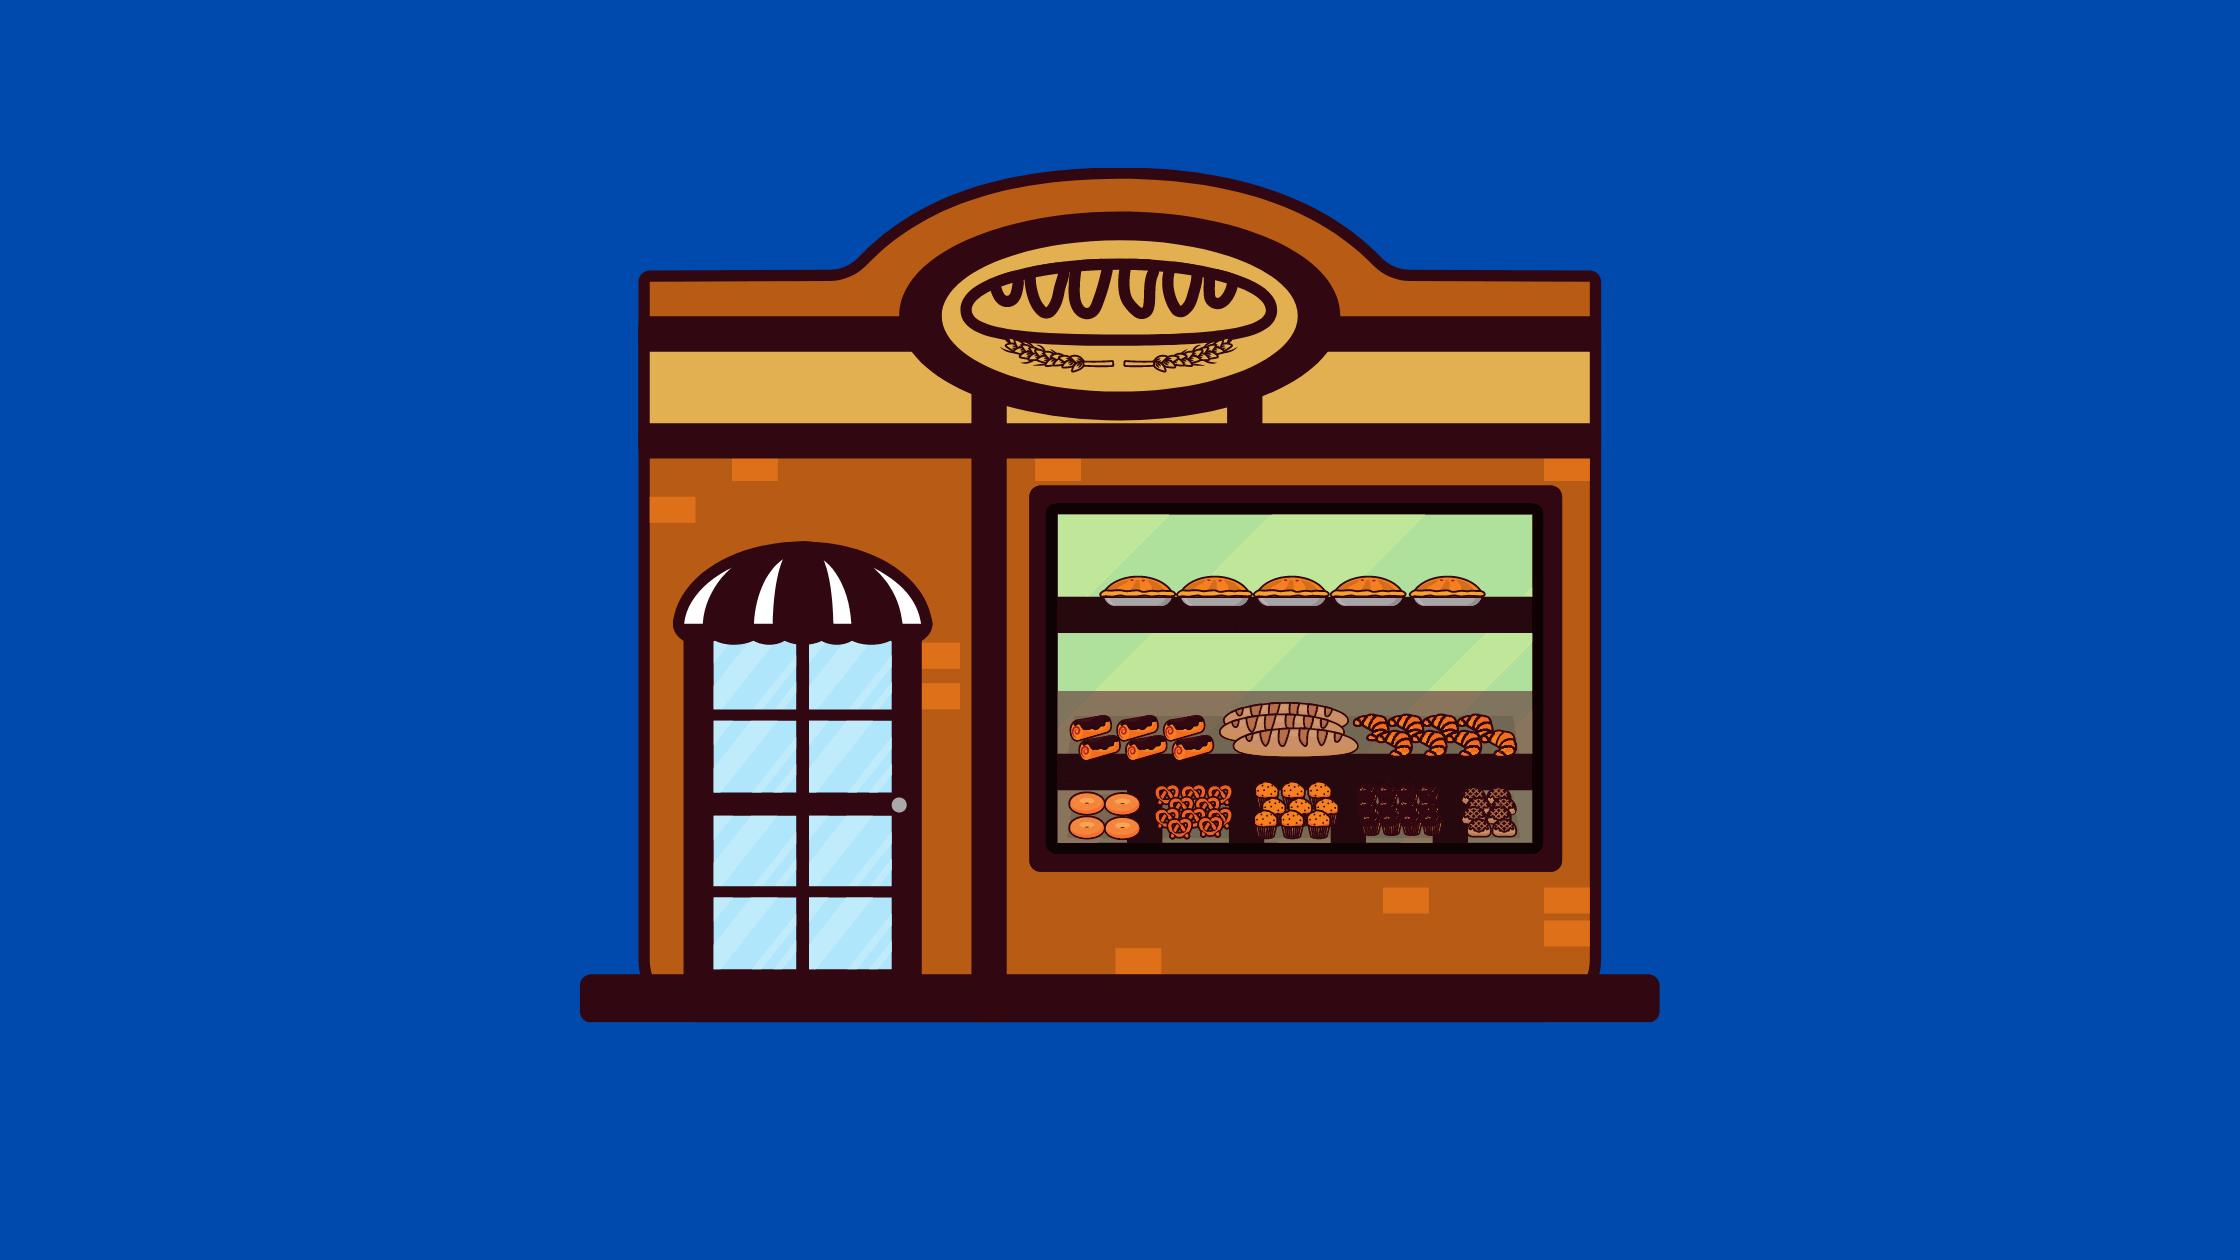 BakeryCustom CakesSnacks Shop